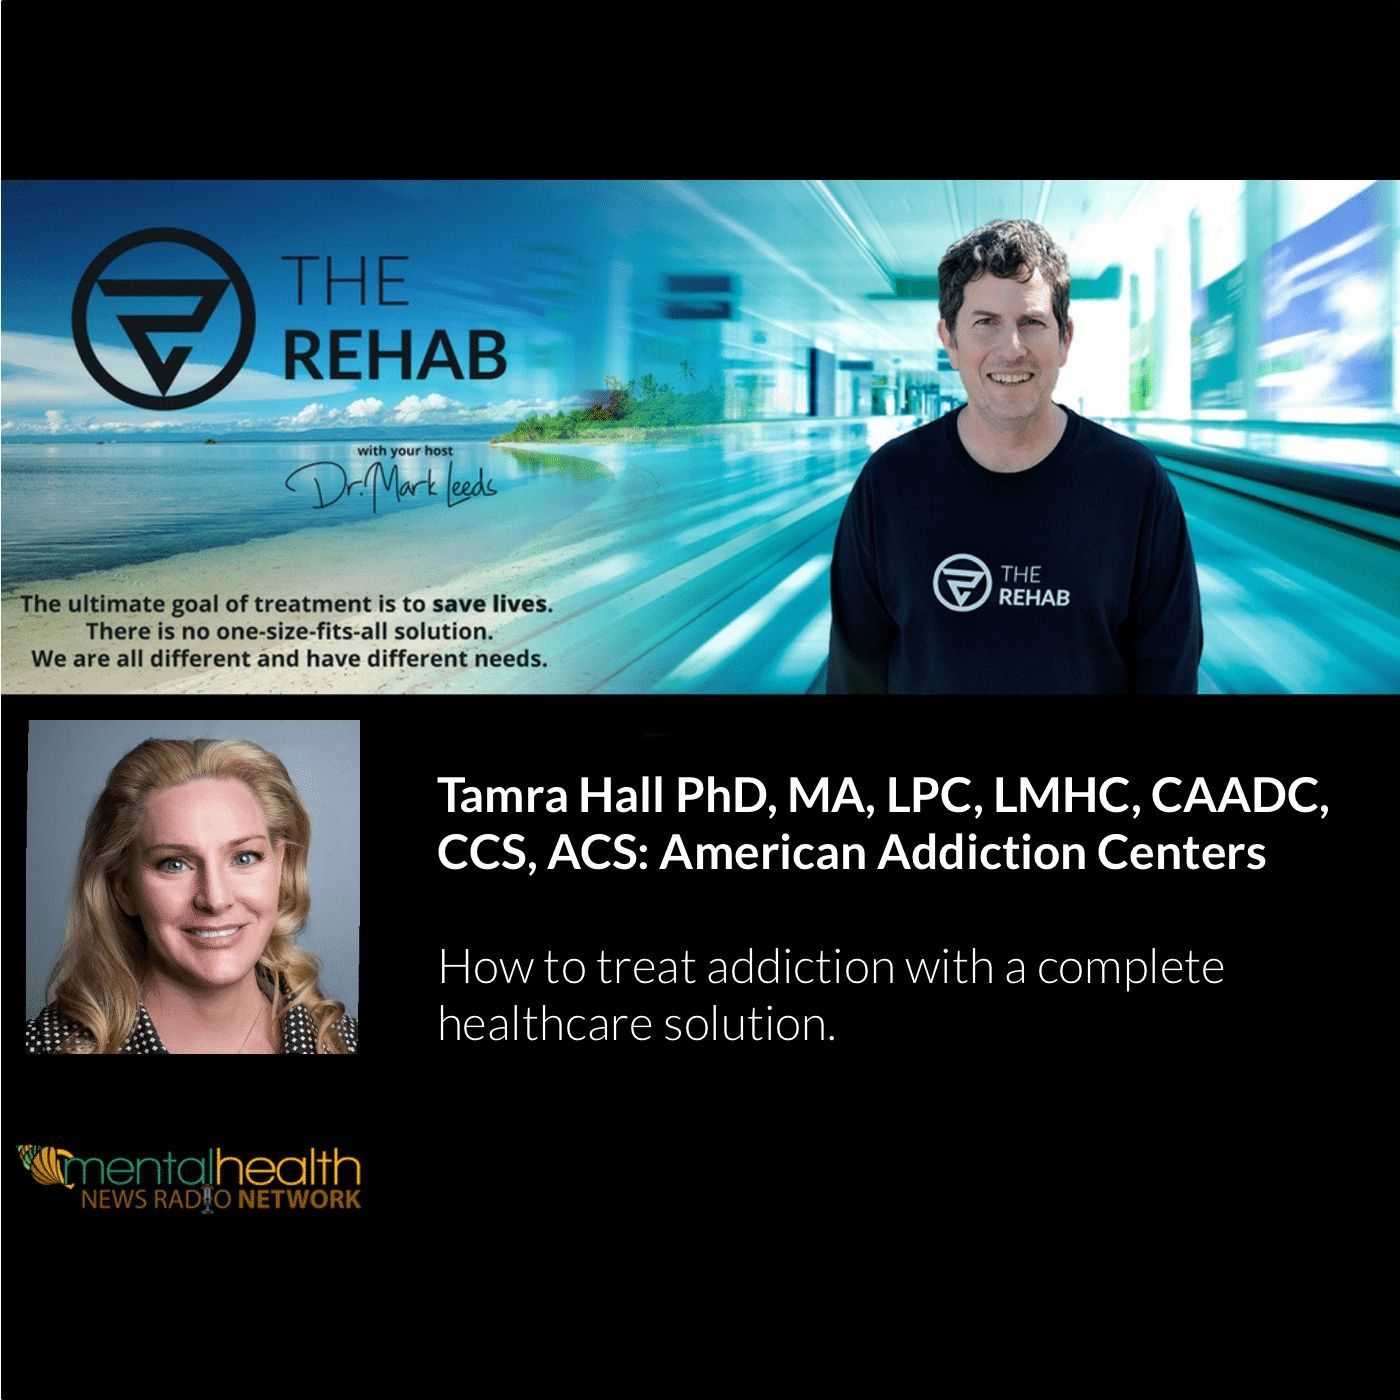 Tamra Hall PhD, MA, LPC, LMHC, CAADC, CCS, ACS: American Addiction Centers